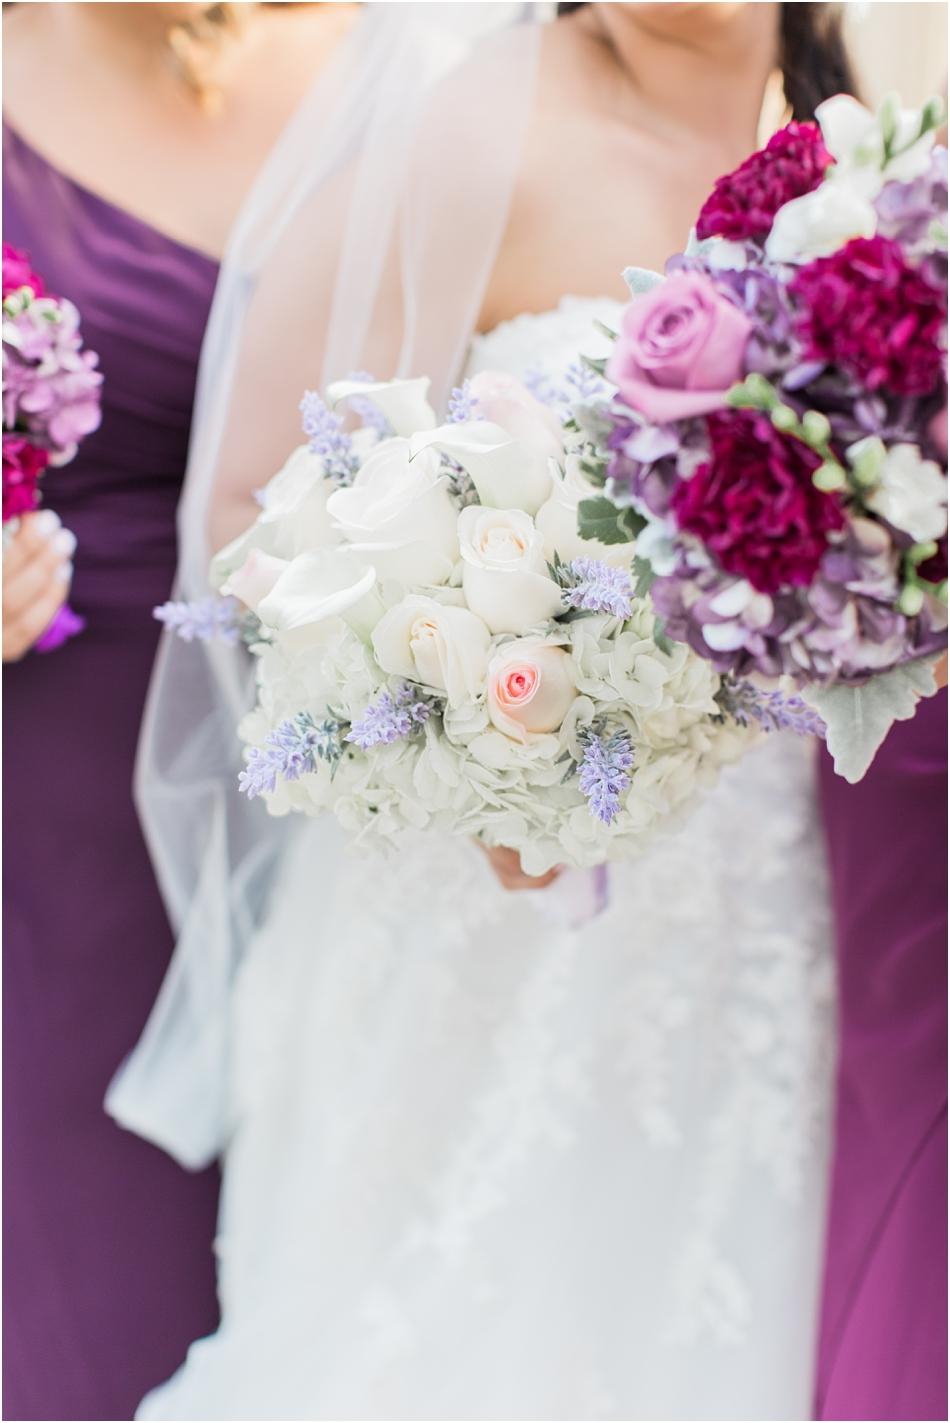 north_reading_lauren_sal_ballroom_cape_cod_boston_new_england_wedding_photographer_Meredith_Jane_Photography_photo_0120.jpg